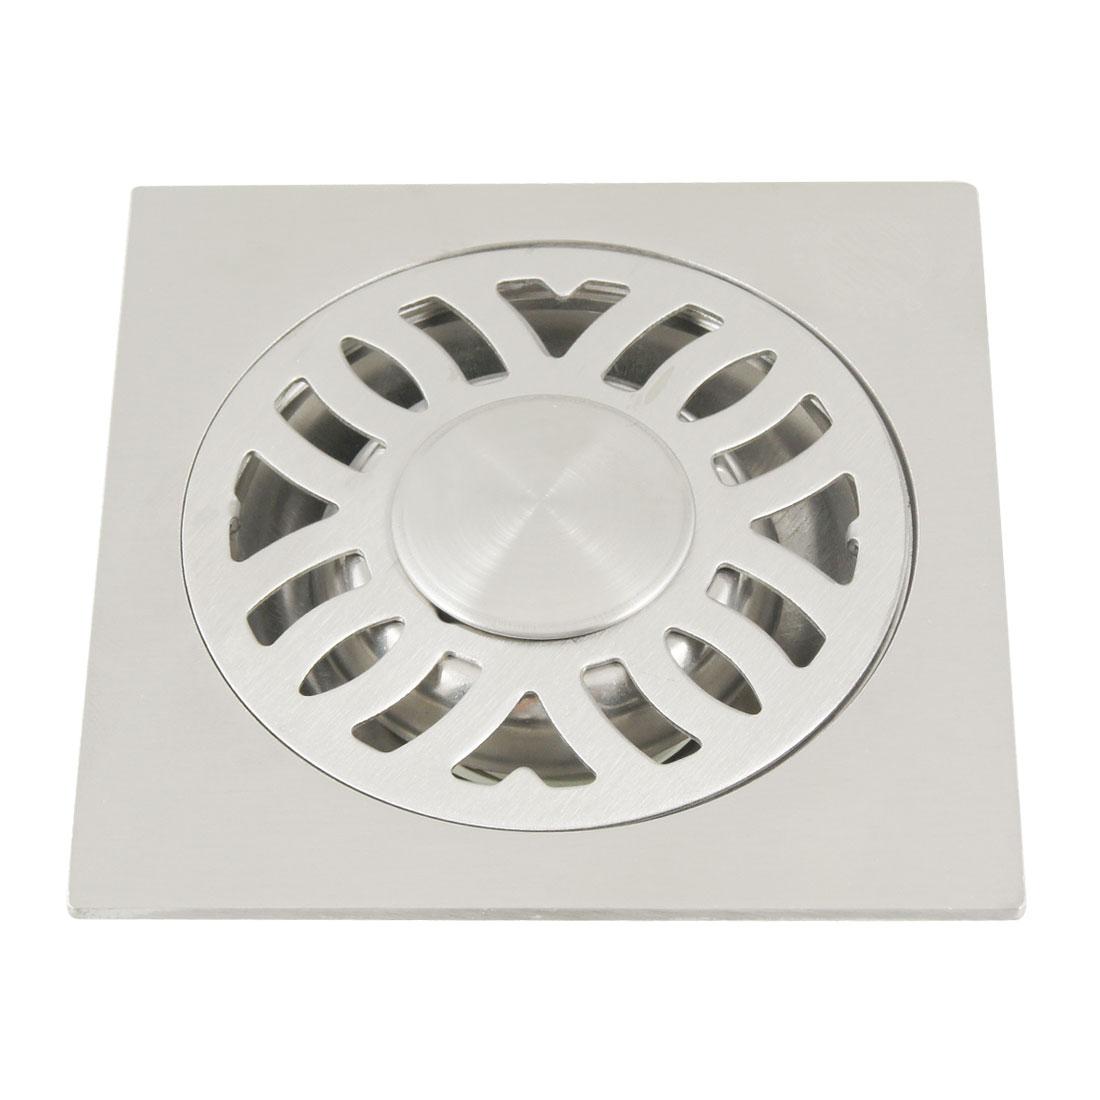 "Bathroom 3.1"" Hole Dia Drain Square Floor Waste Grate Silver Tone"